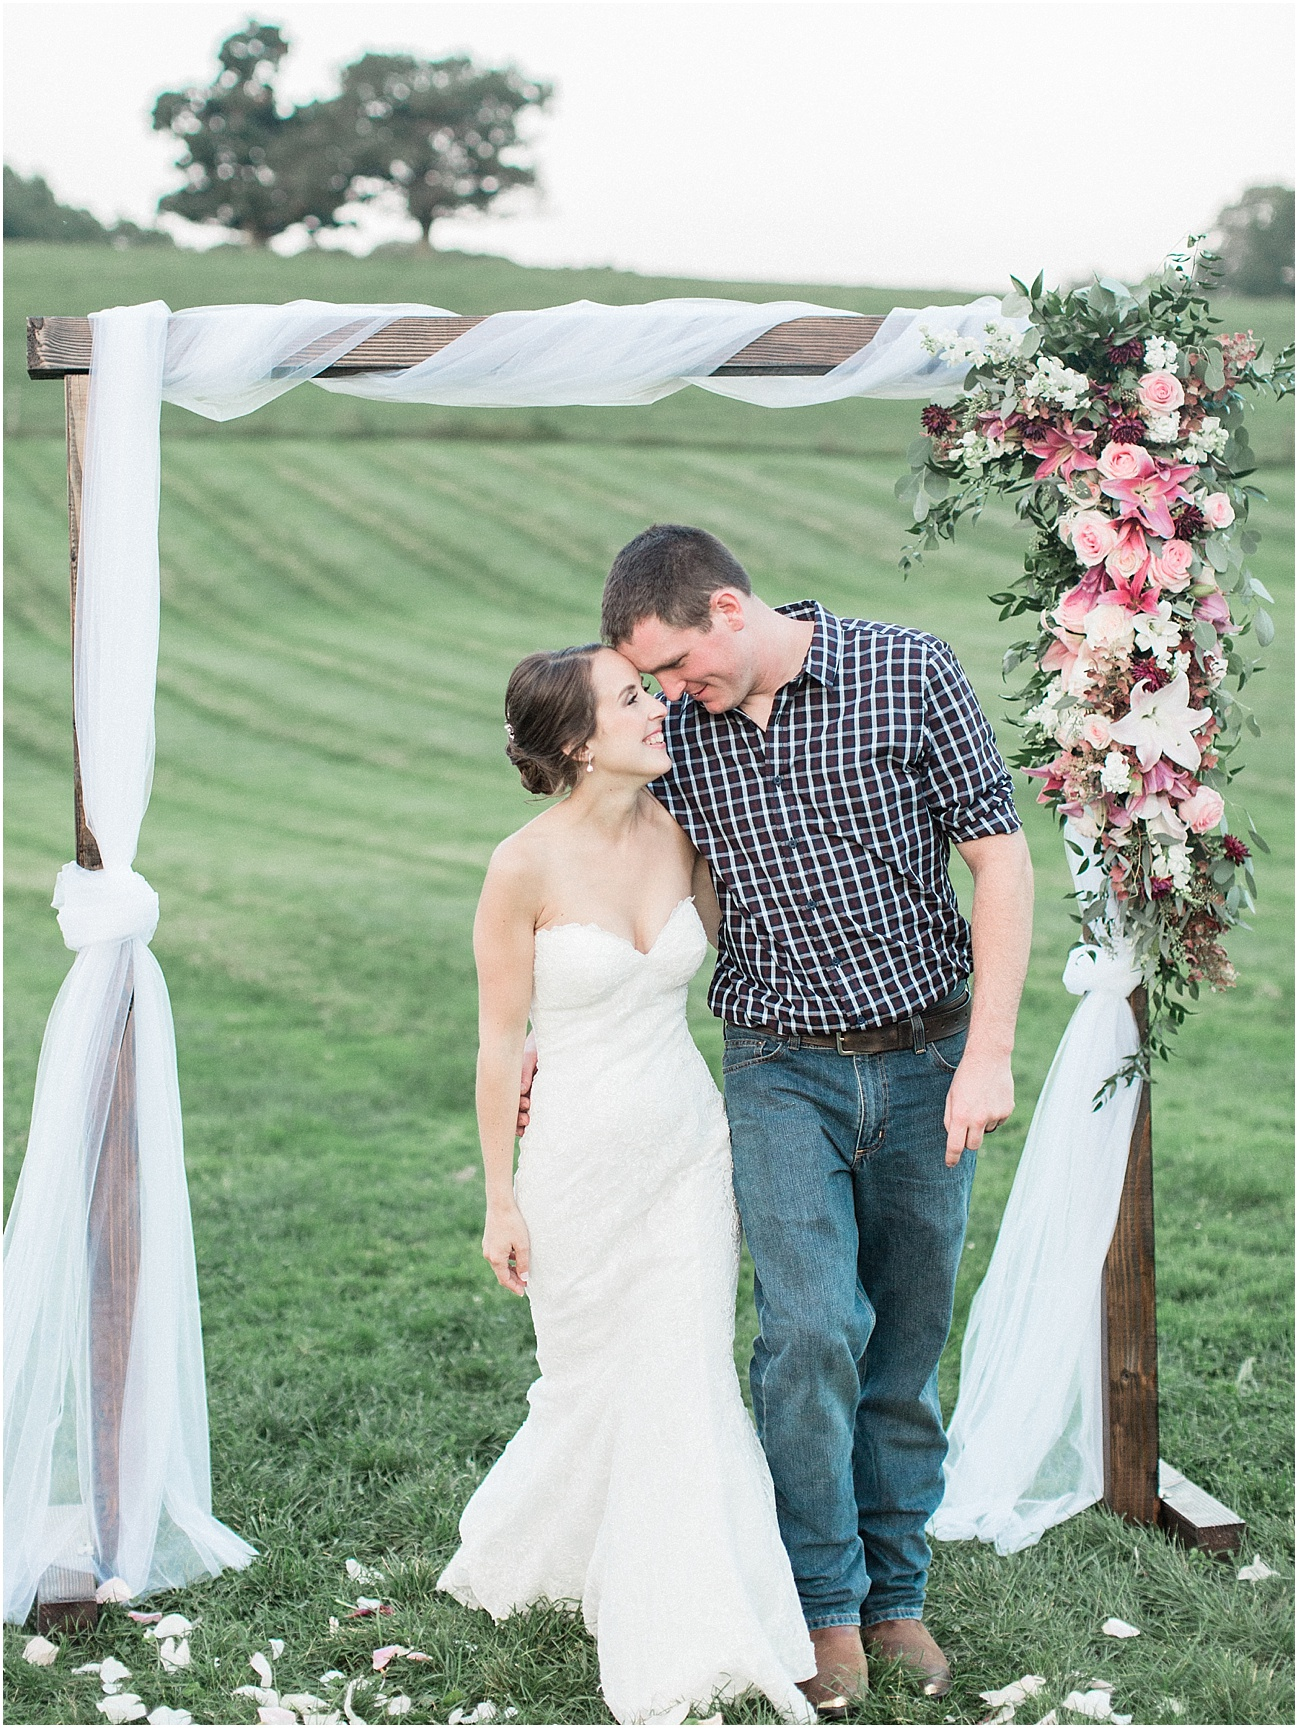 jackie_brad_barn_at_gibbett_hill_country_yellow_lab_fall_burgundy_cape_cod_boston_wedding_photographer_meredith_jane_photography_photo_1052.jpg